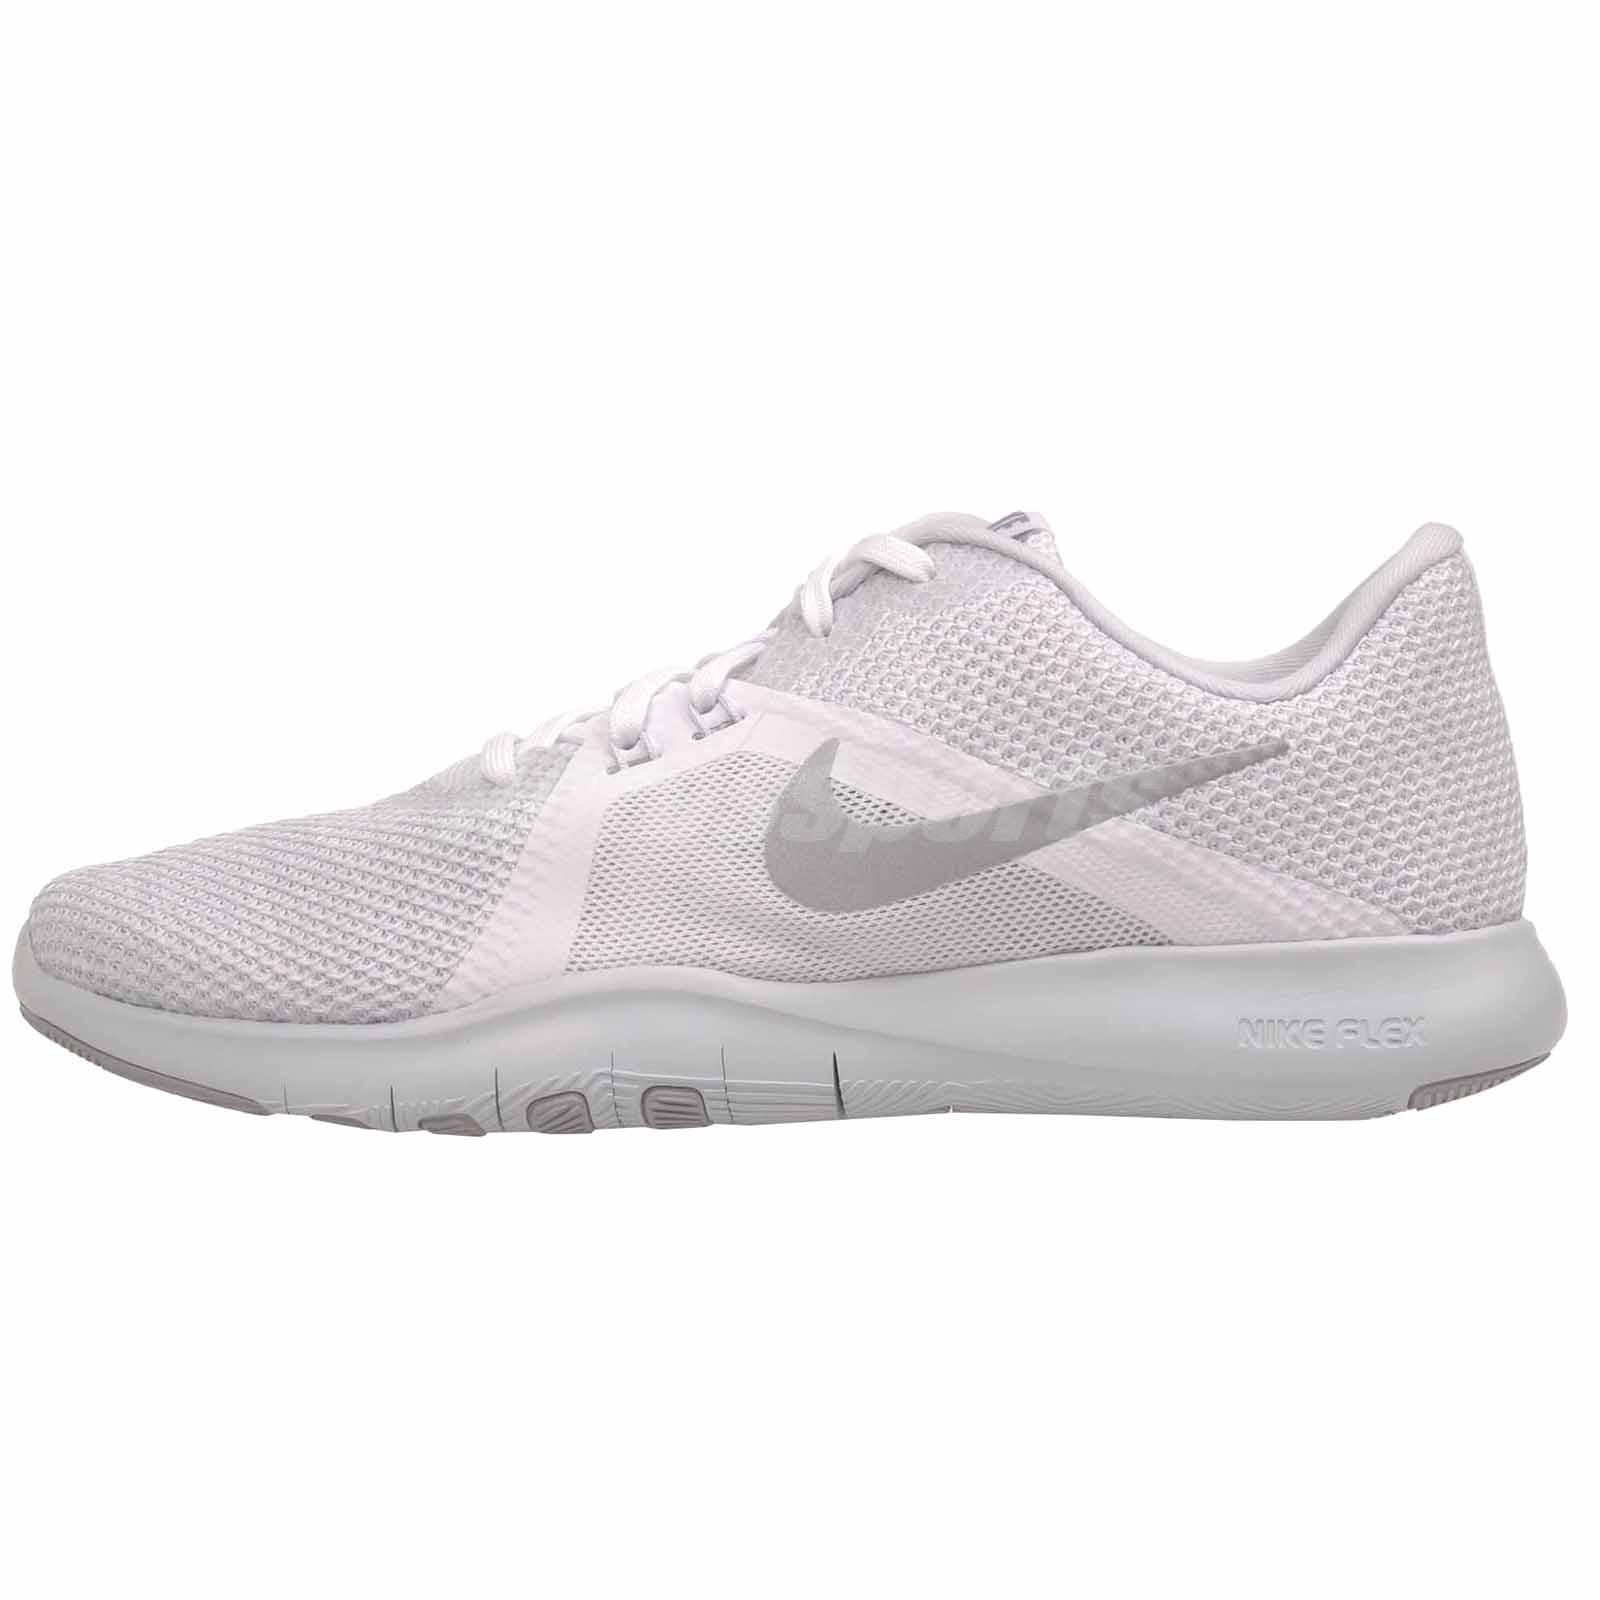 d4b0d2fc4dc639 Details about Nike W Flex Trainer 8 Cross Training Womens Shoes White  Silver 924339-100